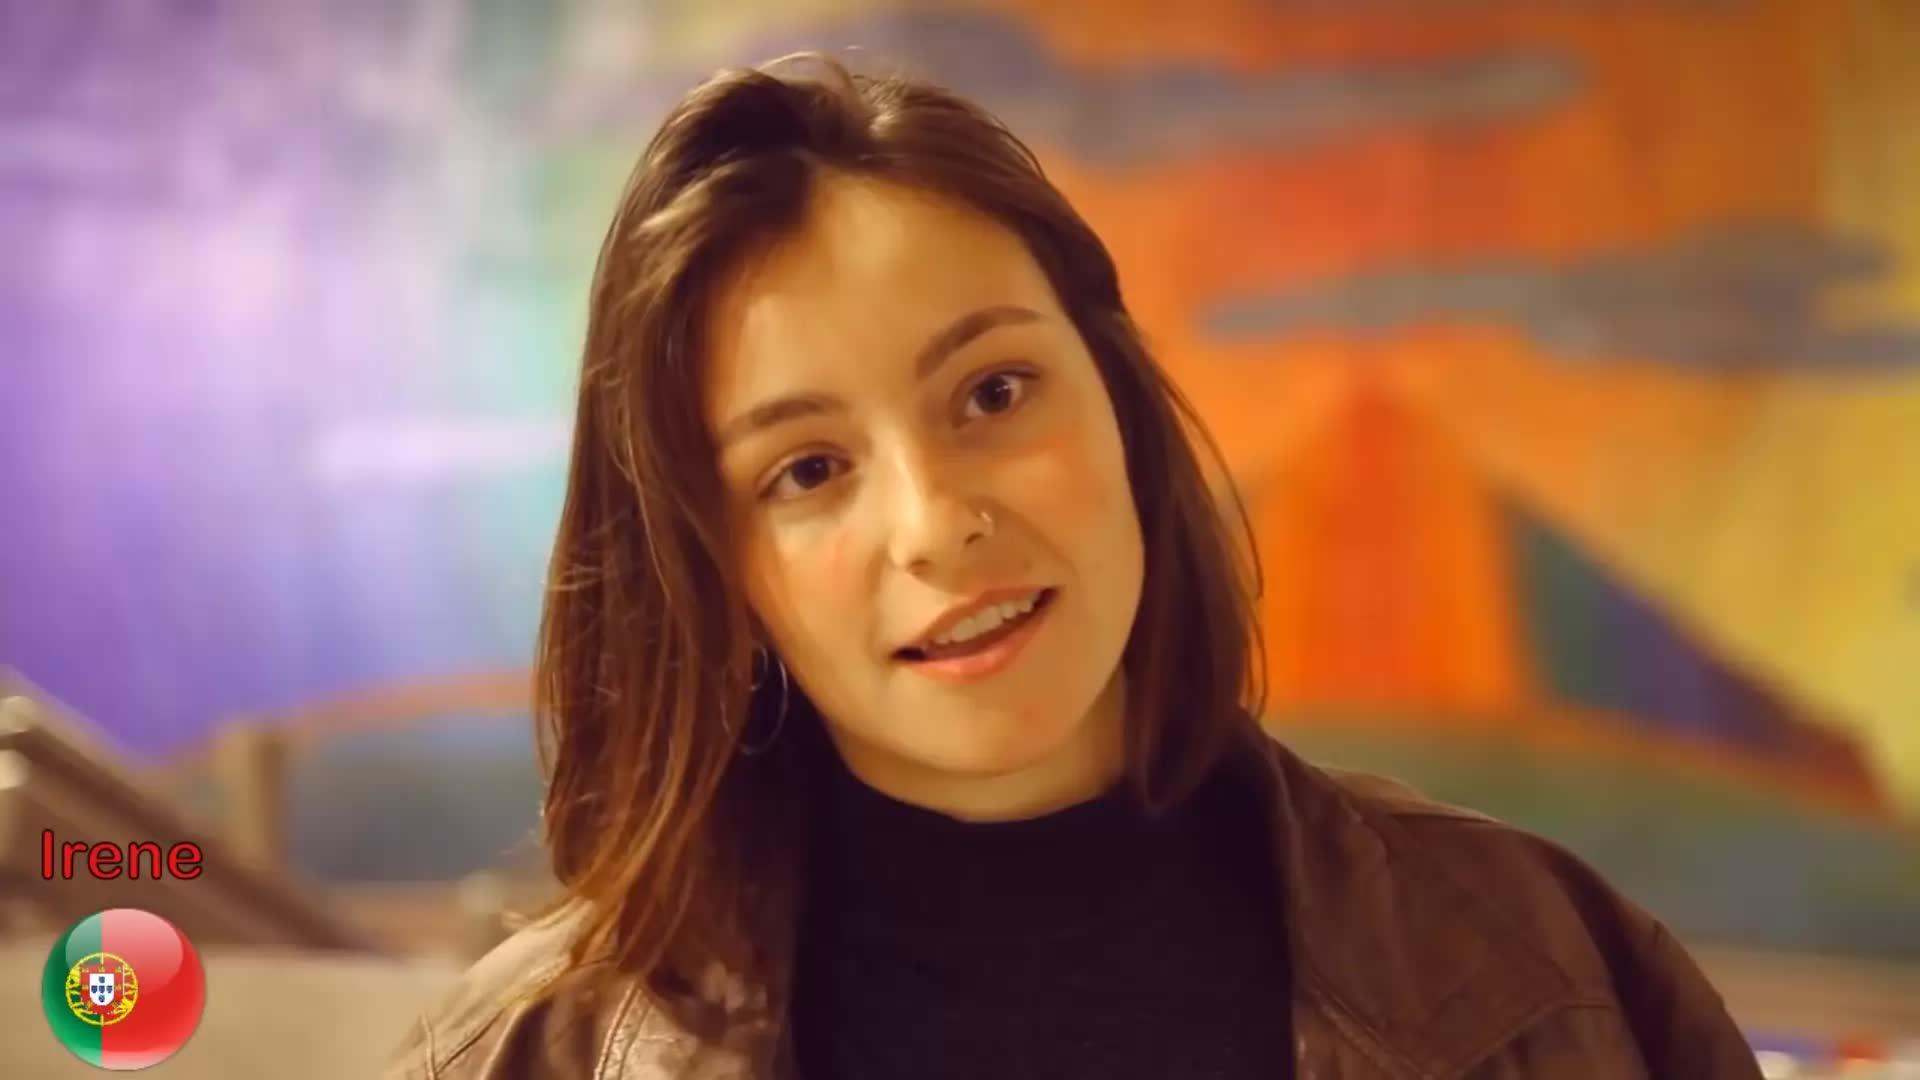 Irene Portugal GIFs